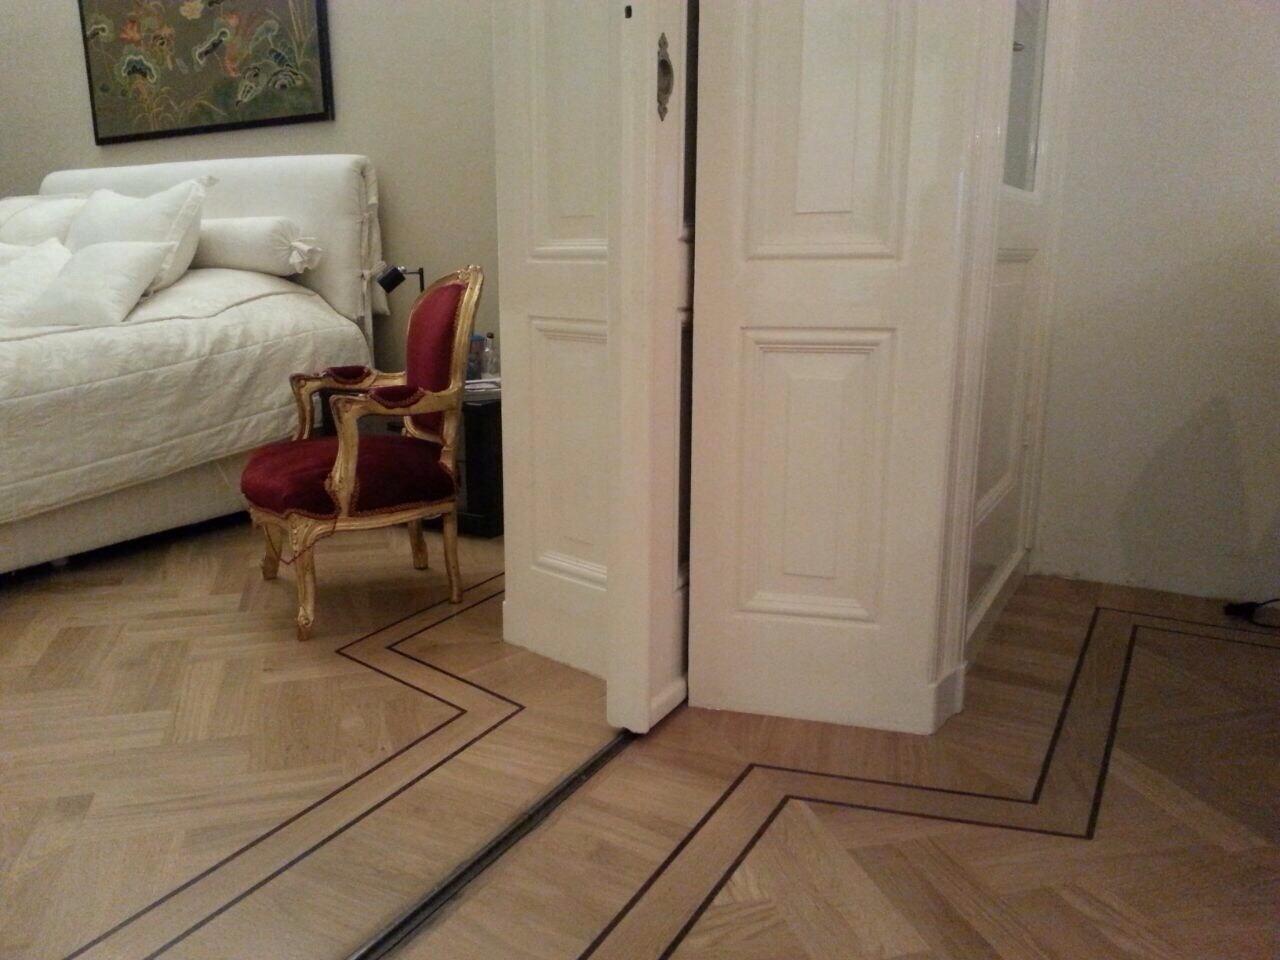 Laminaat Leggen Slaapkamer : Laminaat leggen slaapkamer classic laminaat voor slaapkamer